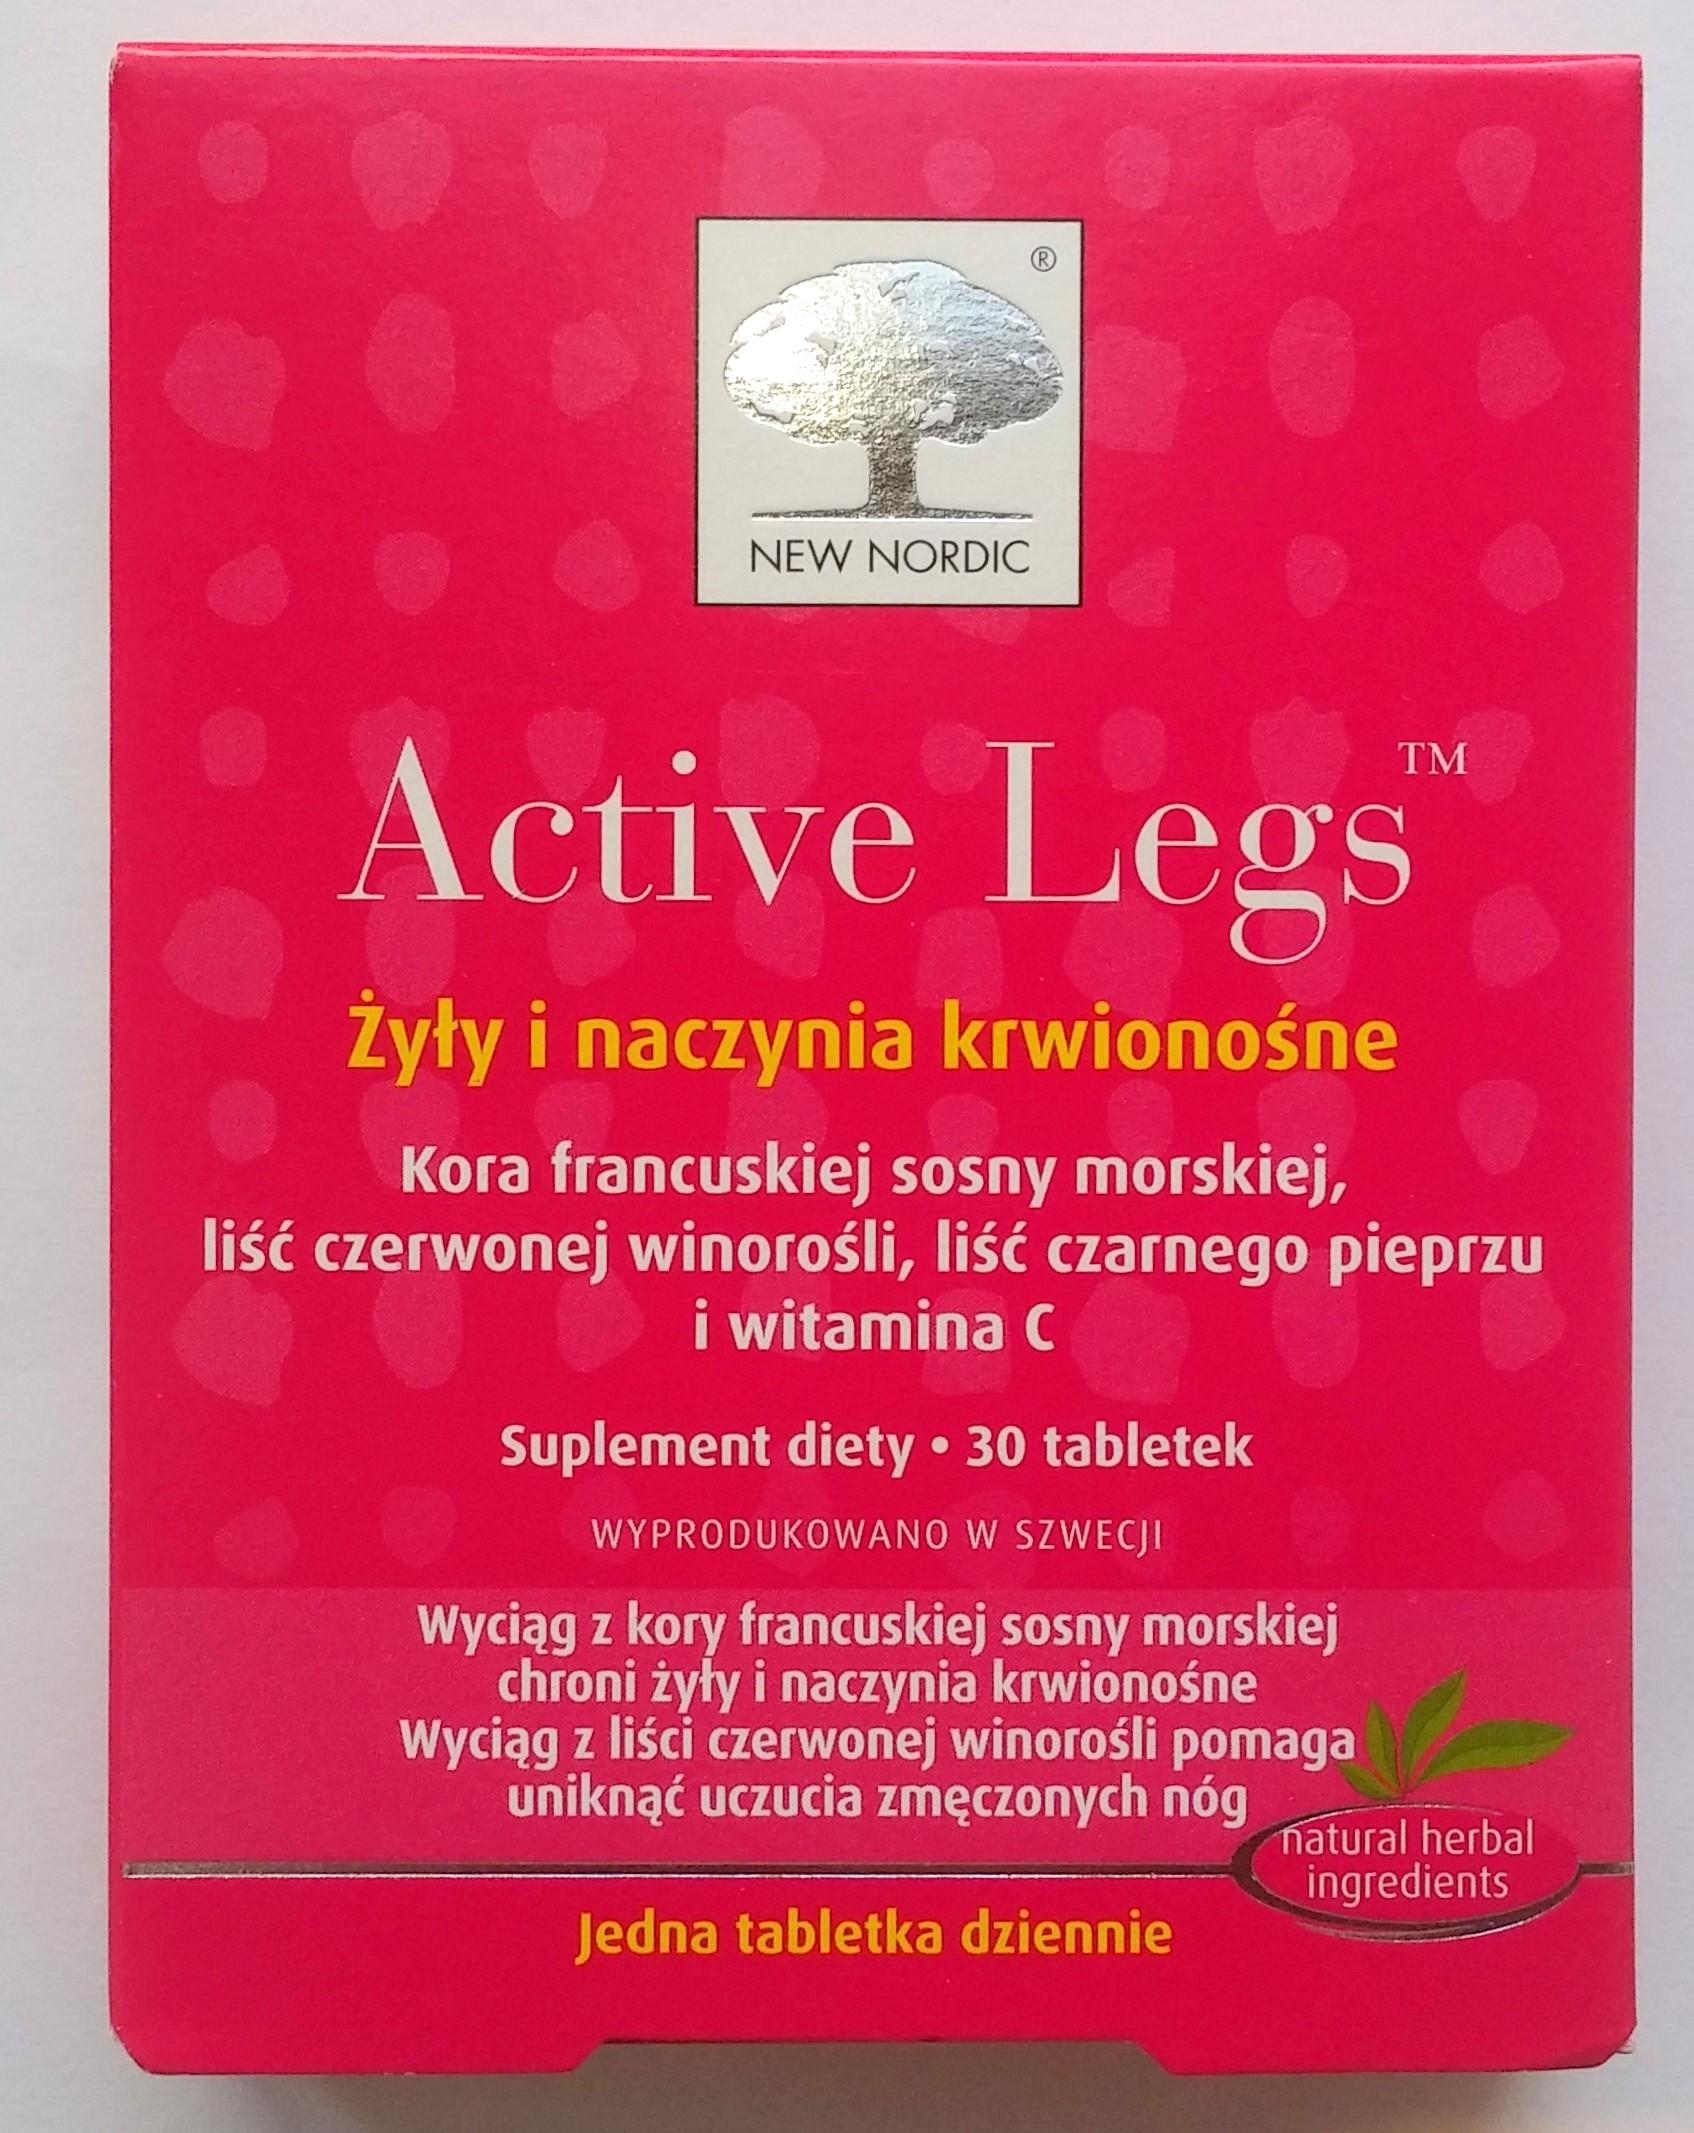 NEW NORDIC Active Legs 30 tabl New Nordic 3348161